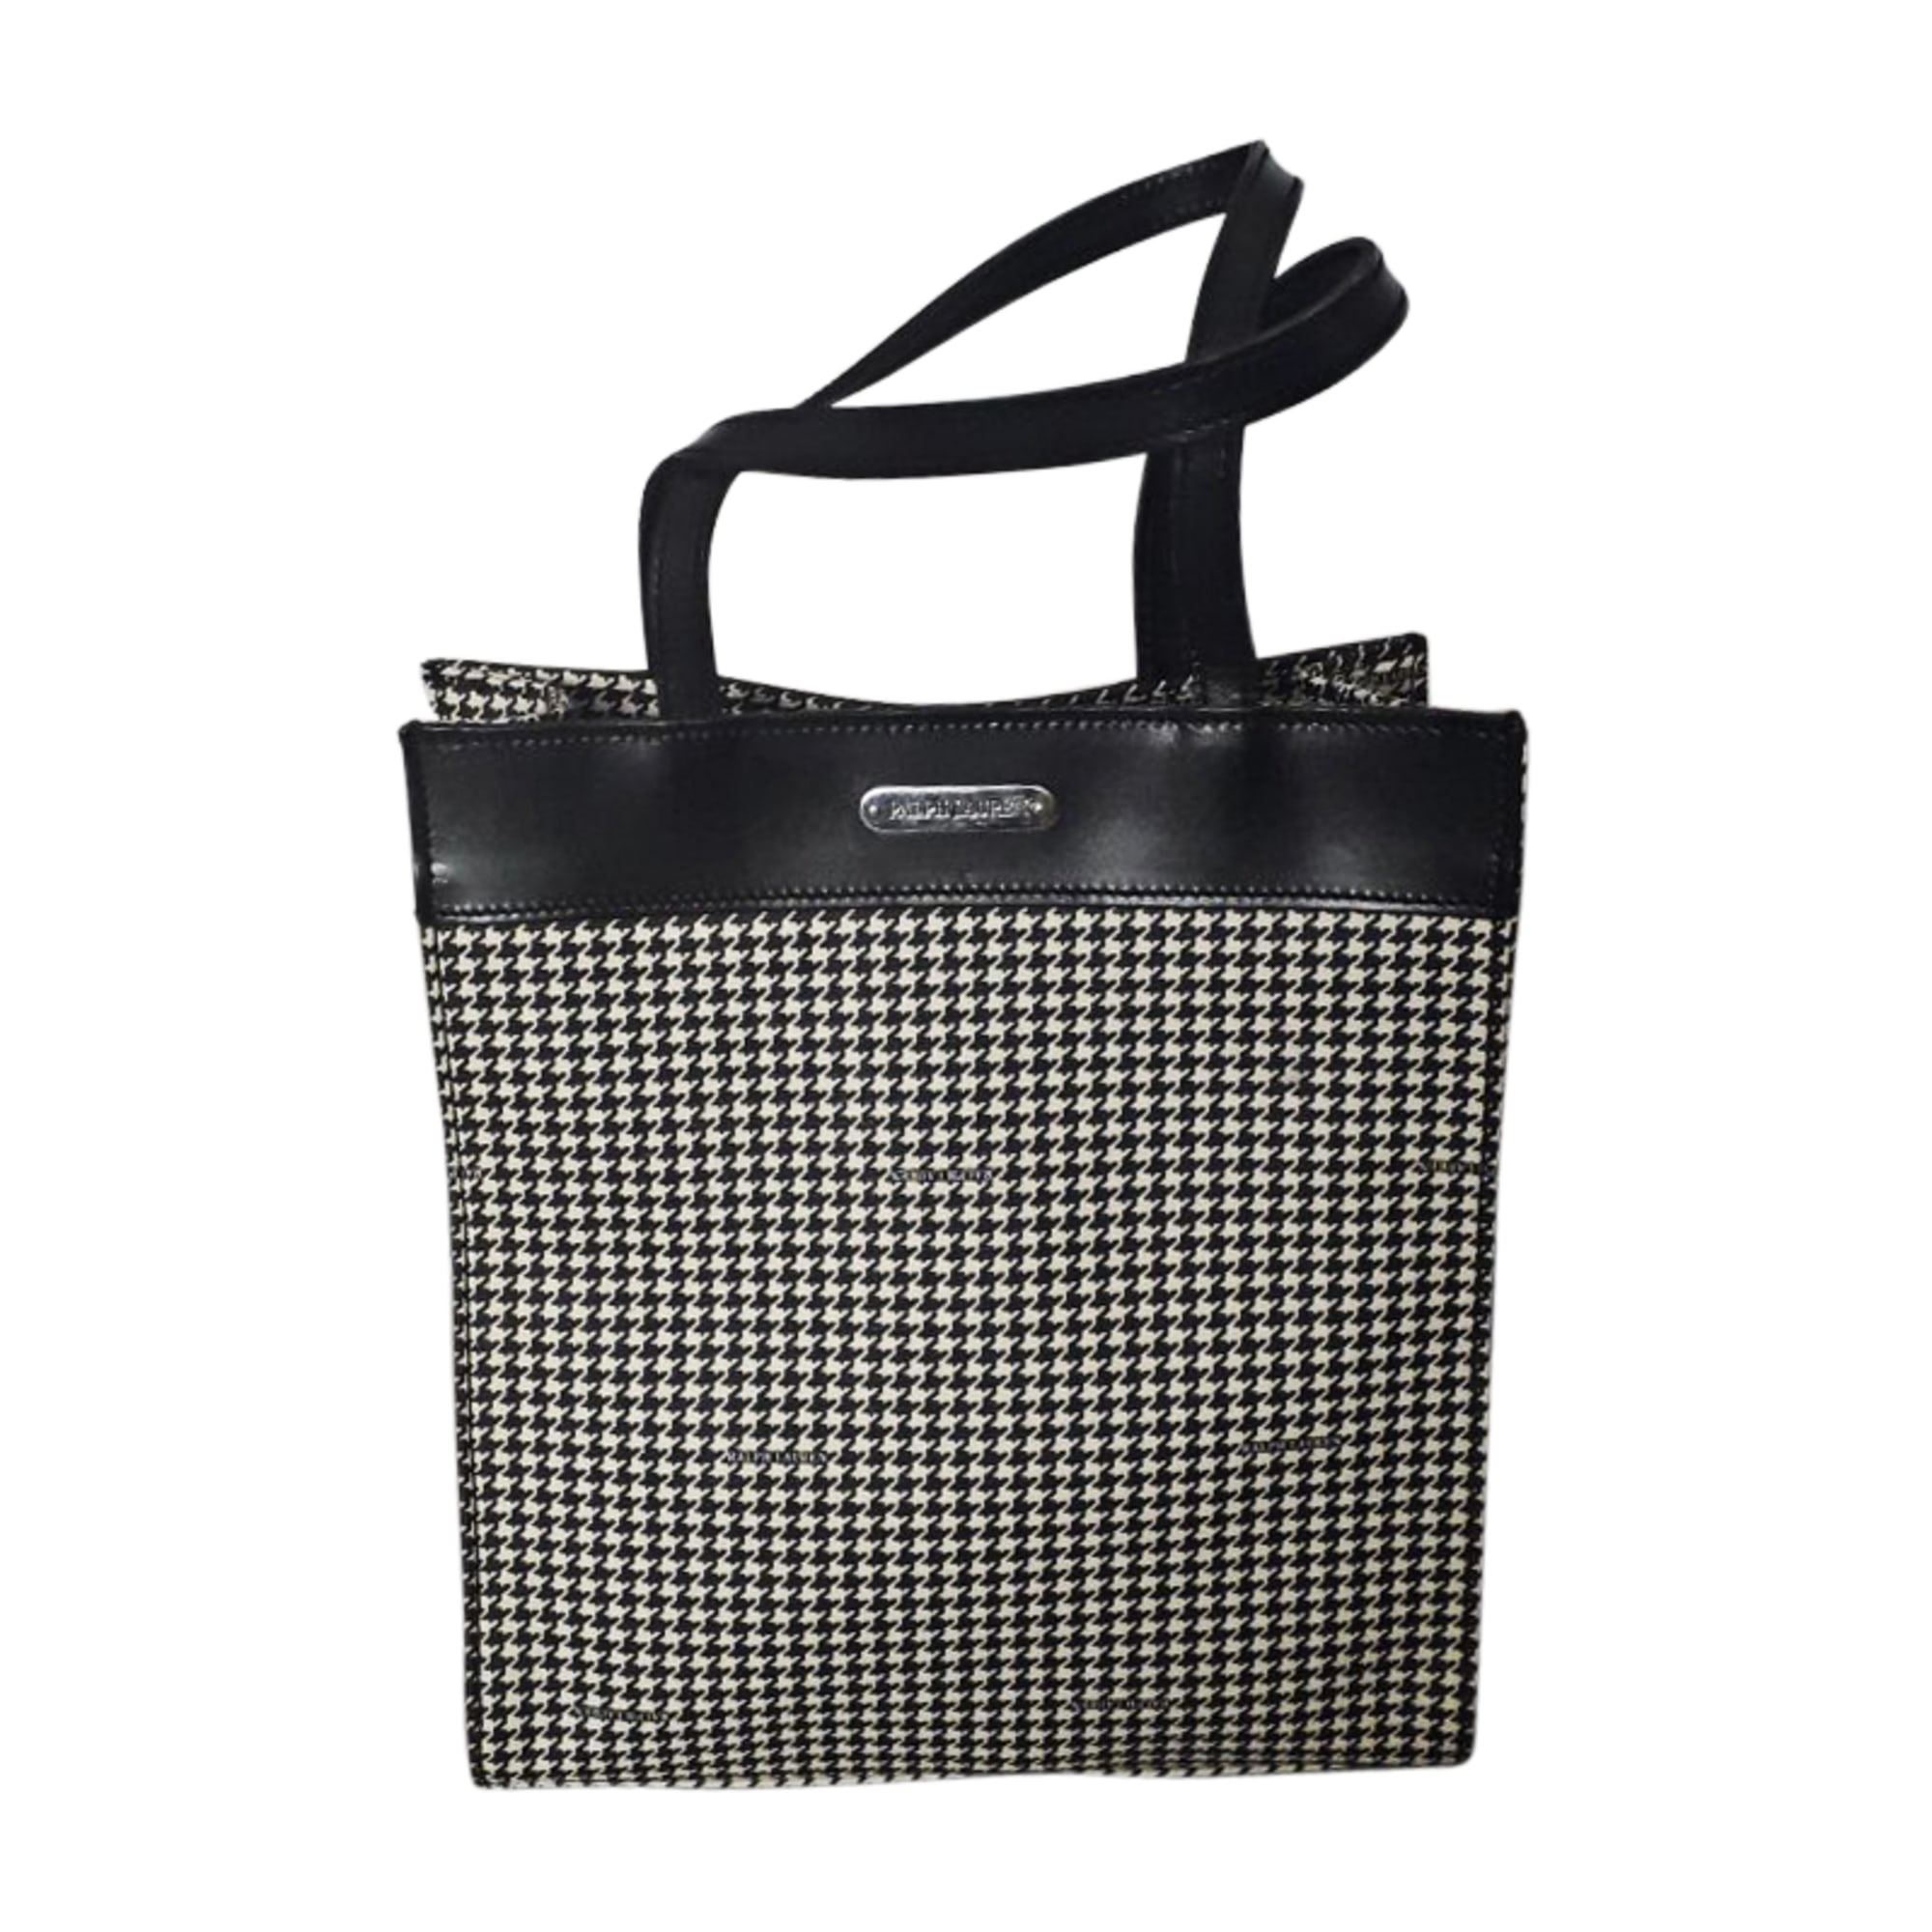 Lederhandtasche RALPH LAUREN noir et blanc